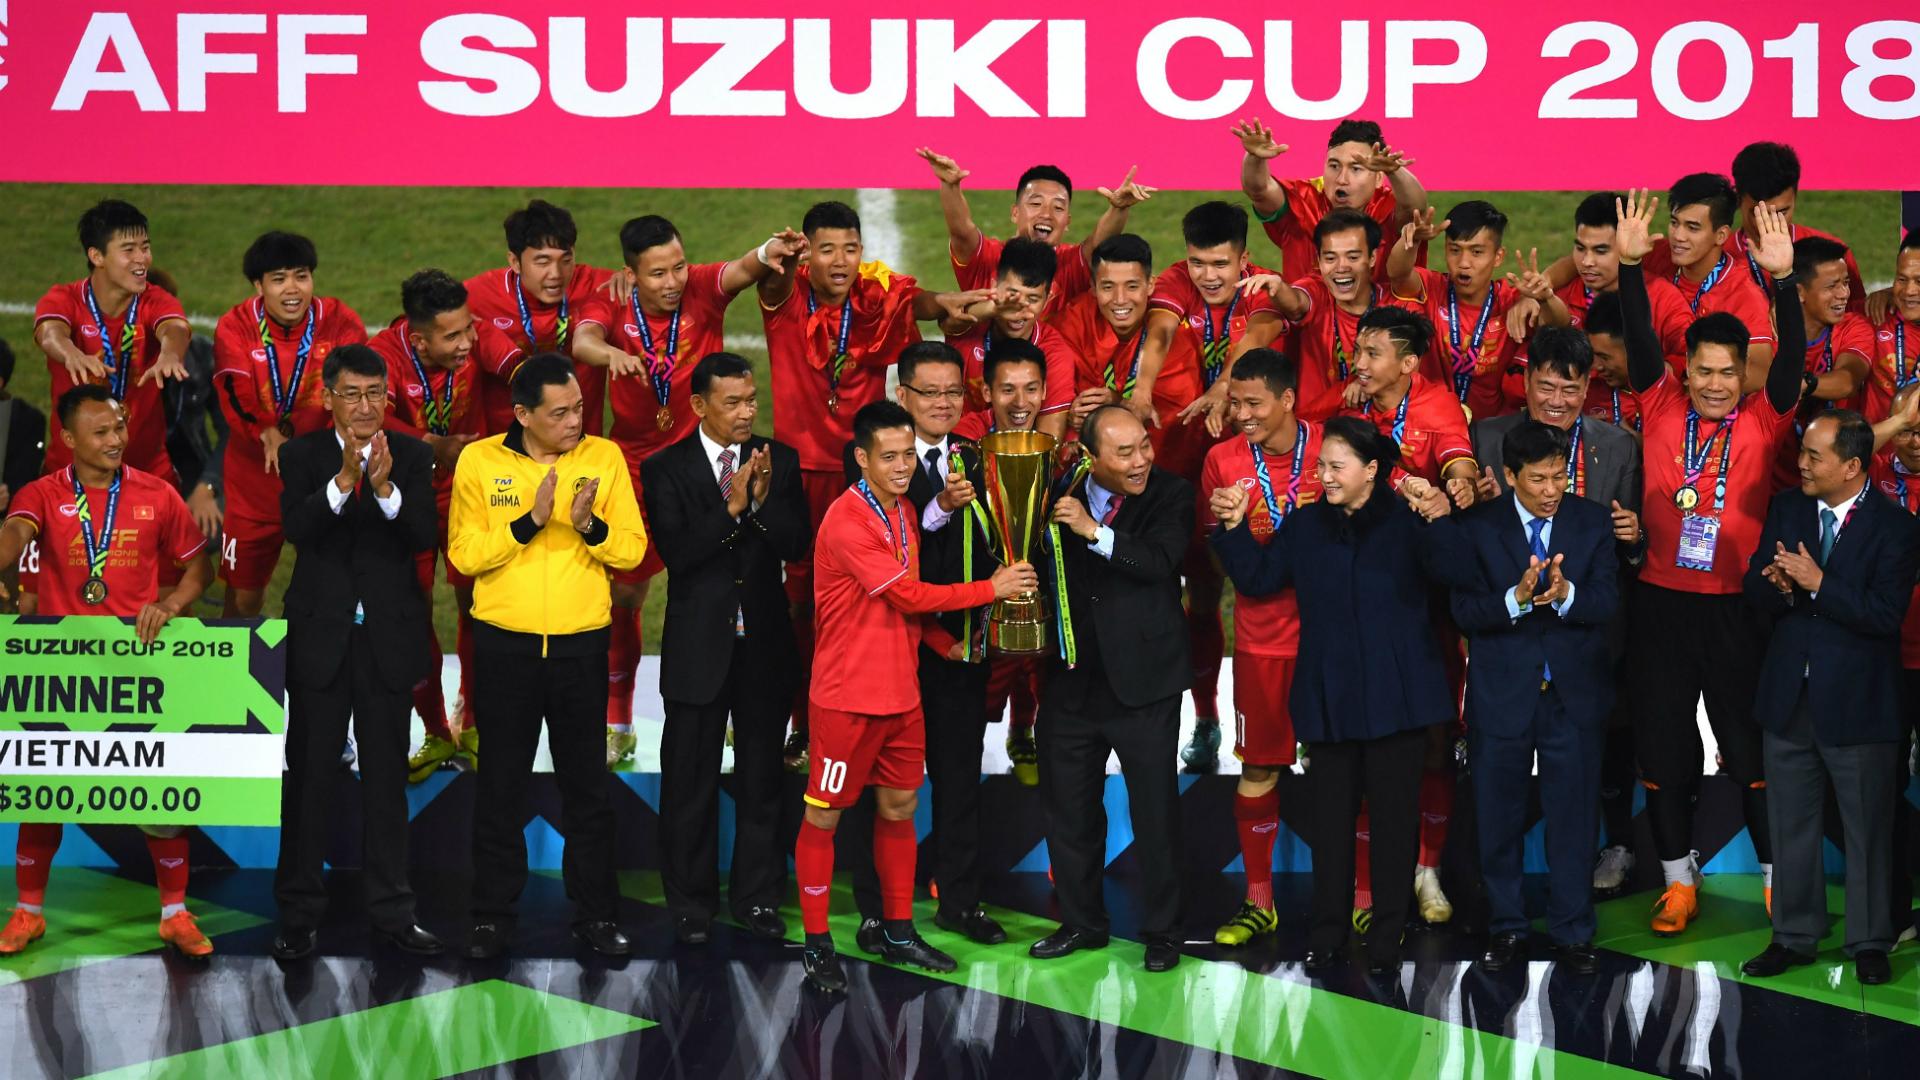 Datuk Hamidin, 2018 AFF Suzuki Cup